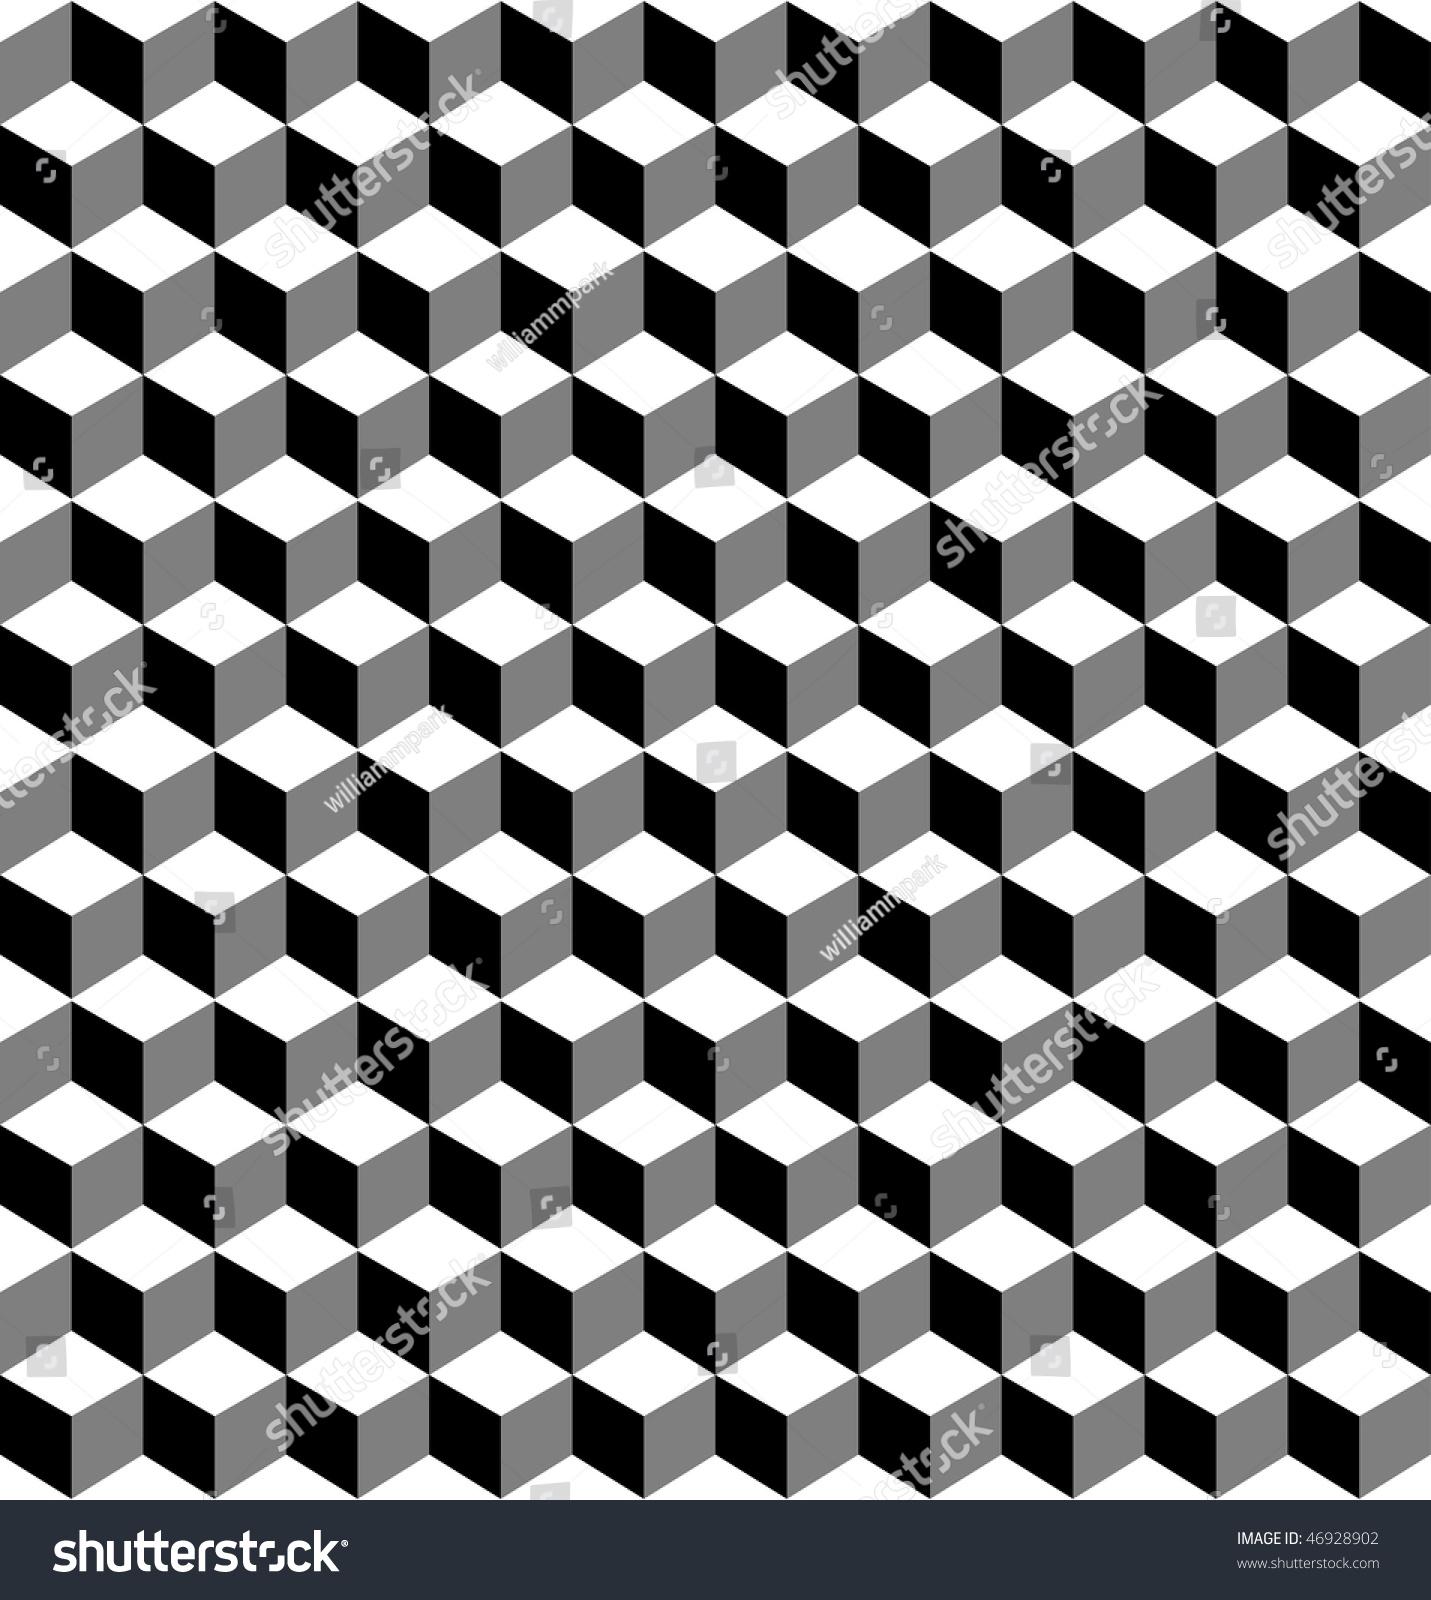 Cube Pattern Stock Illustration 46928902 - Shutterstock